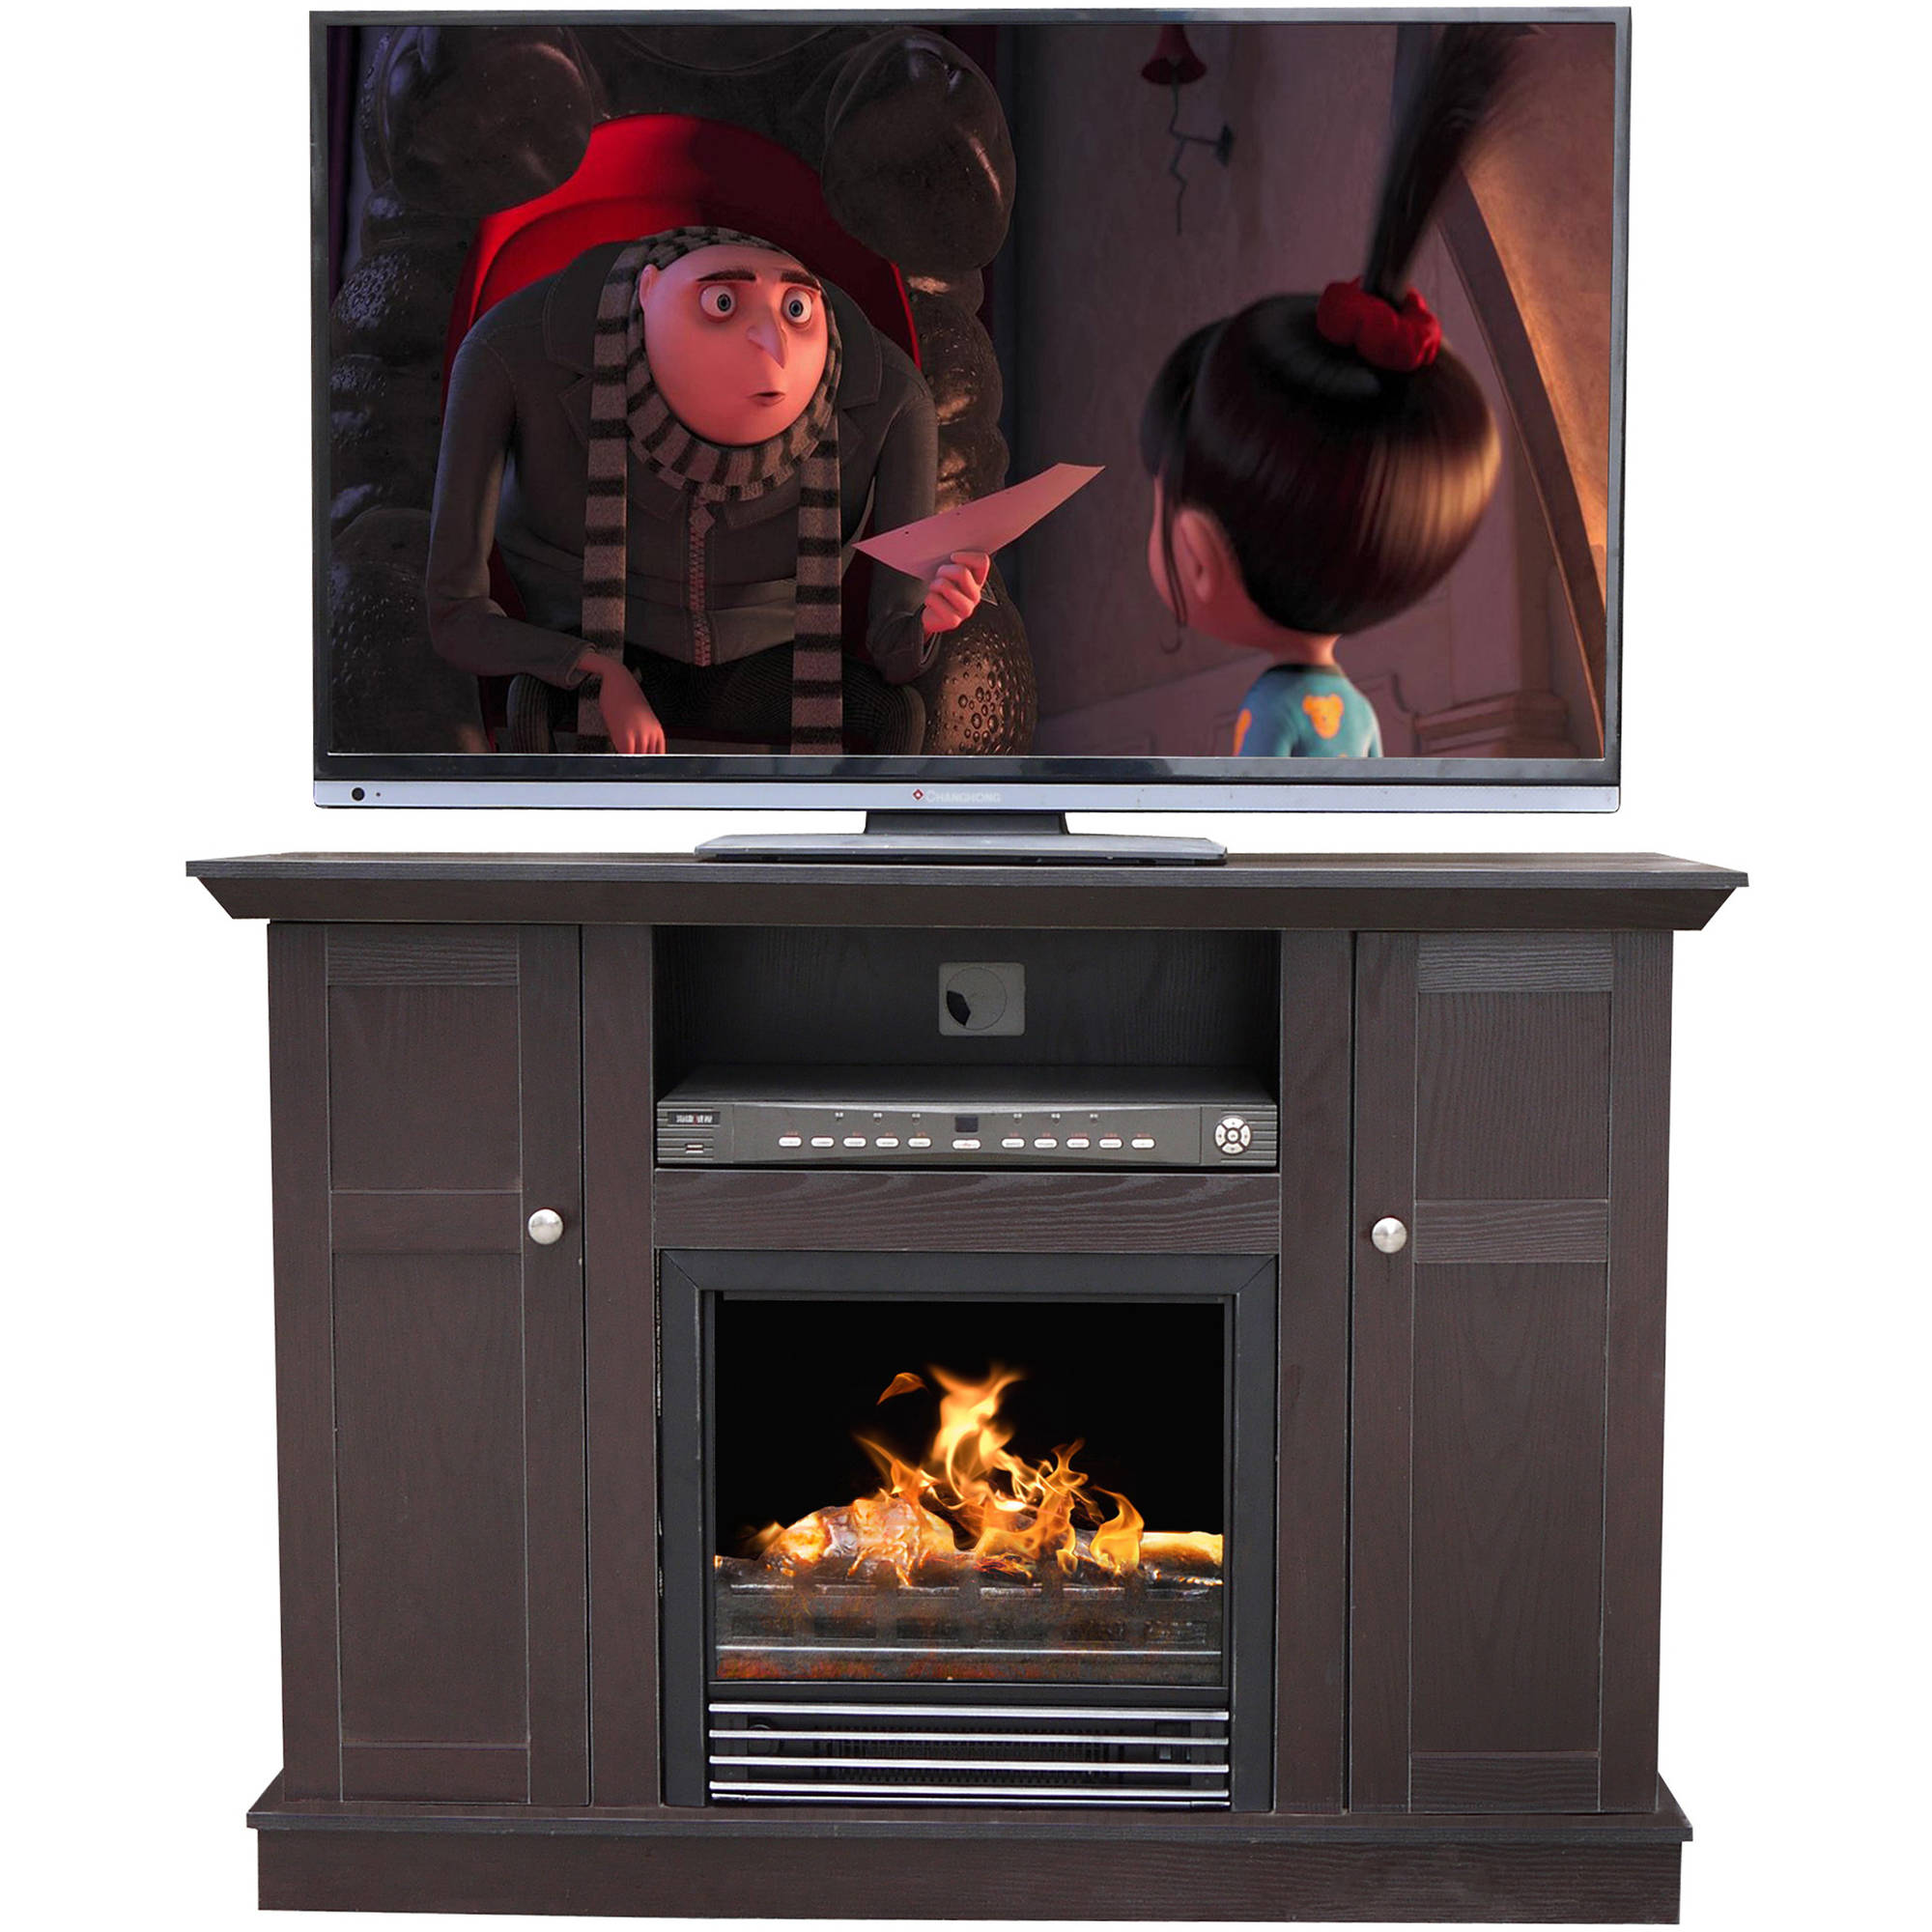 Muskoka Personal Desktop Electric Fireplace Electric Fireplace Heat